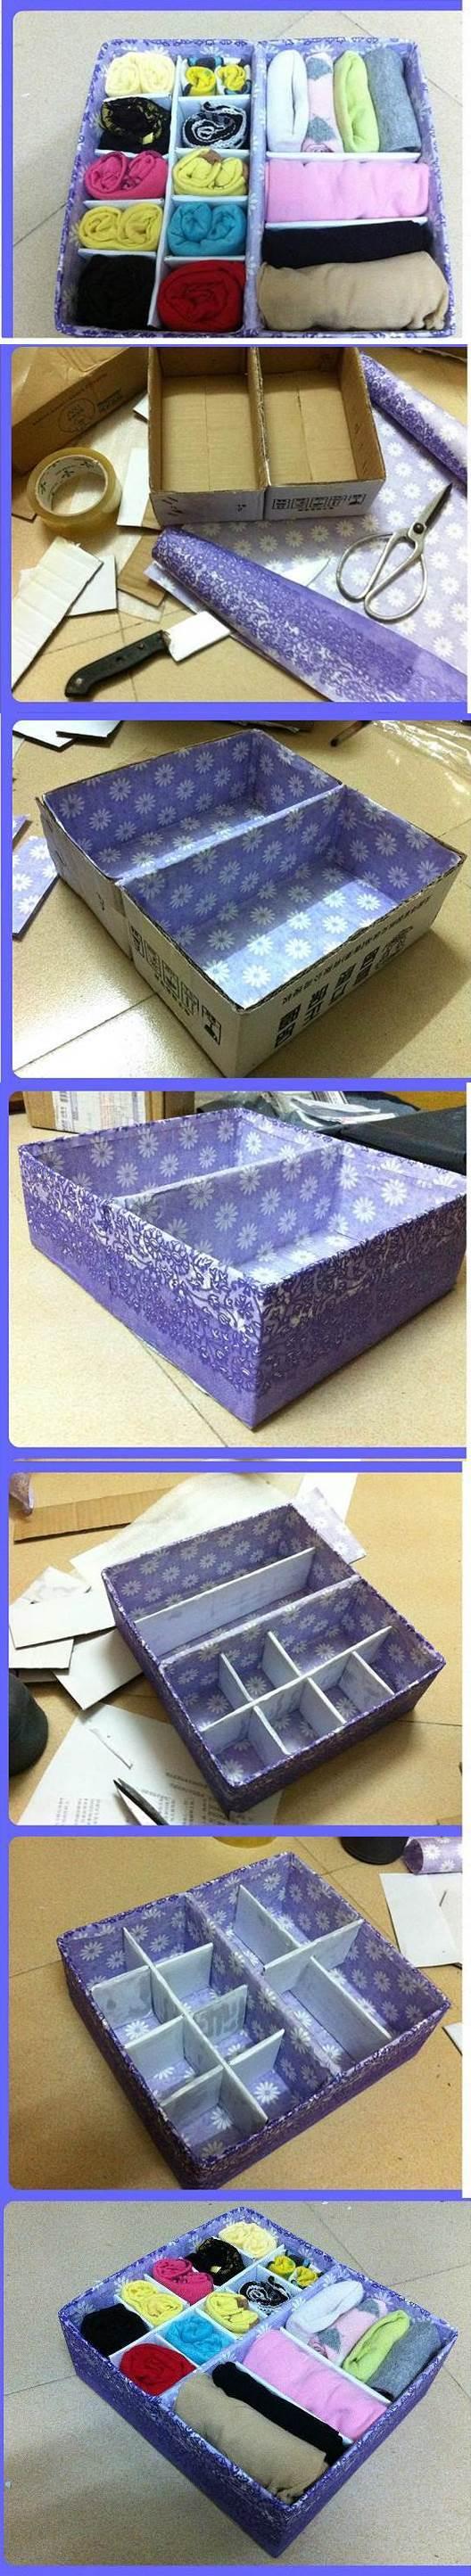 DIY Cardboard Underwear Storage Box